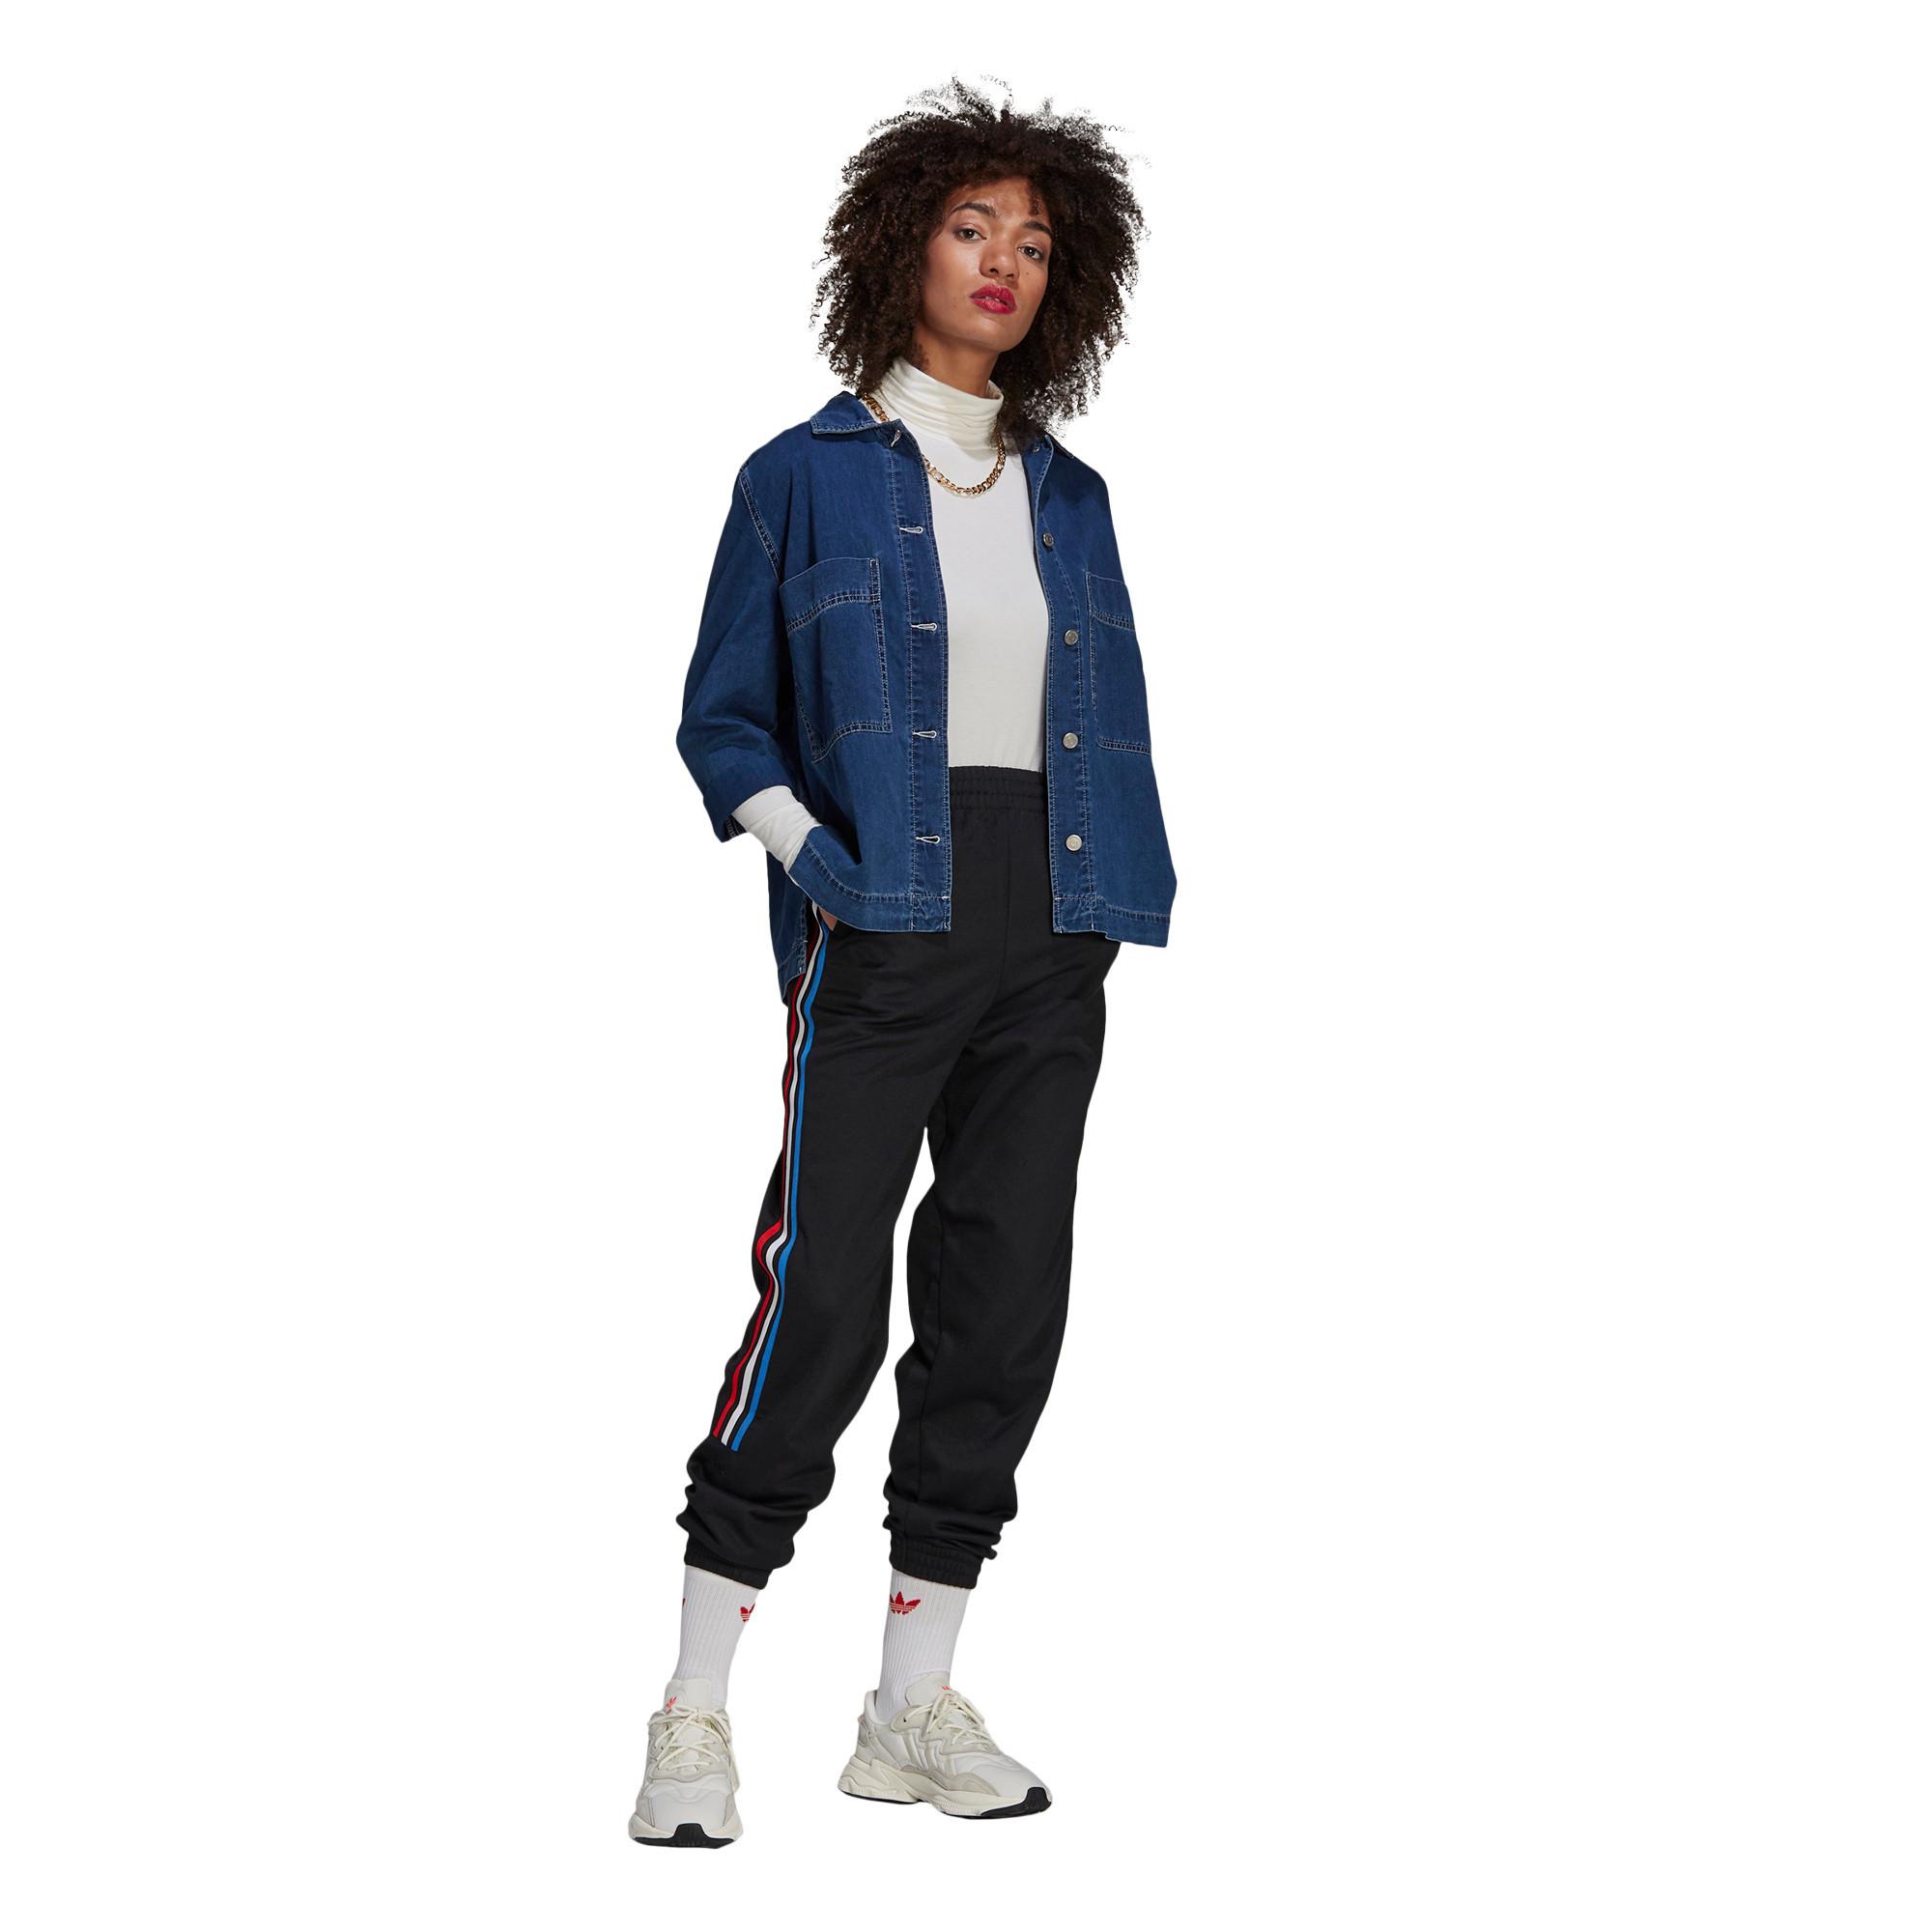 Pantaloni tuta adicolor Tricolor Primeblue, Nero, large image number 6